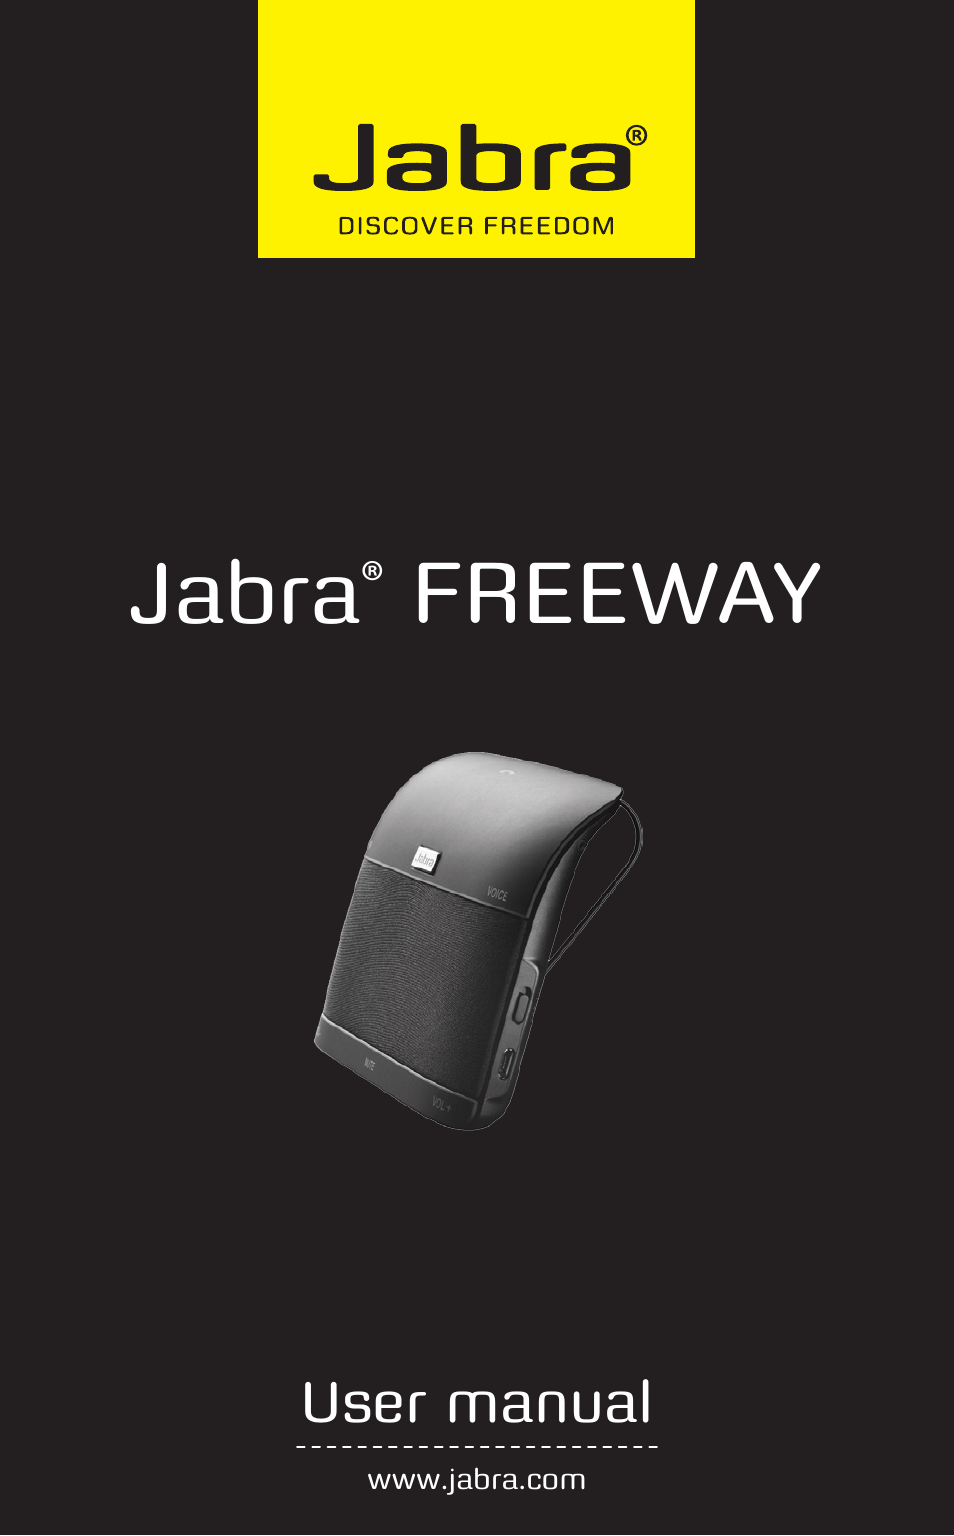 jabra bt135 manual download